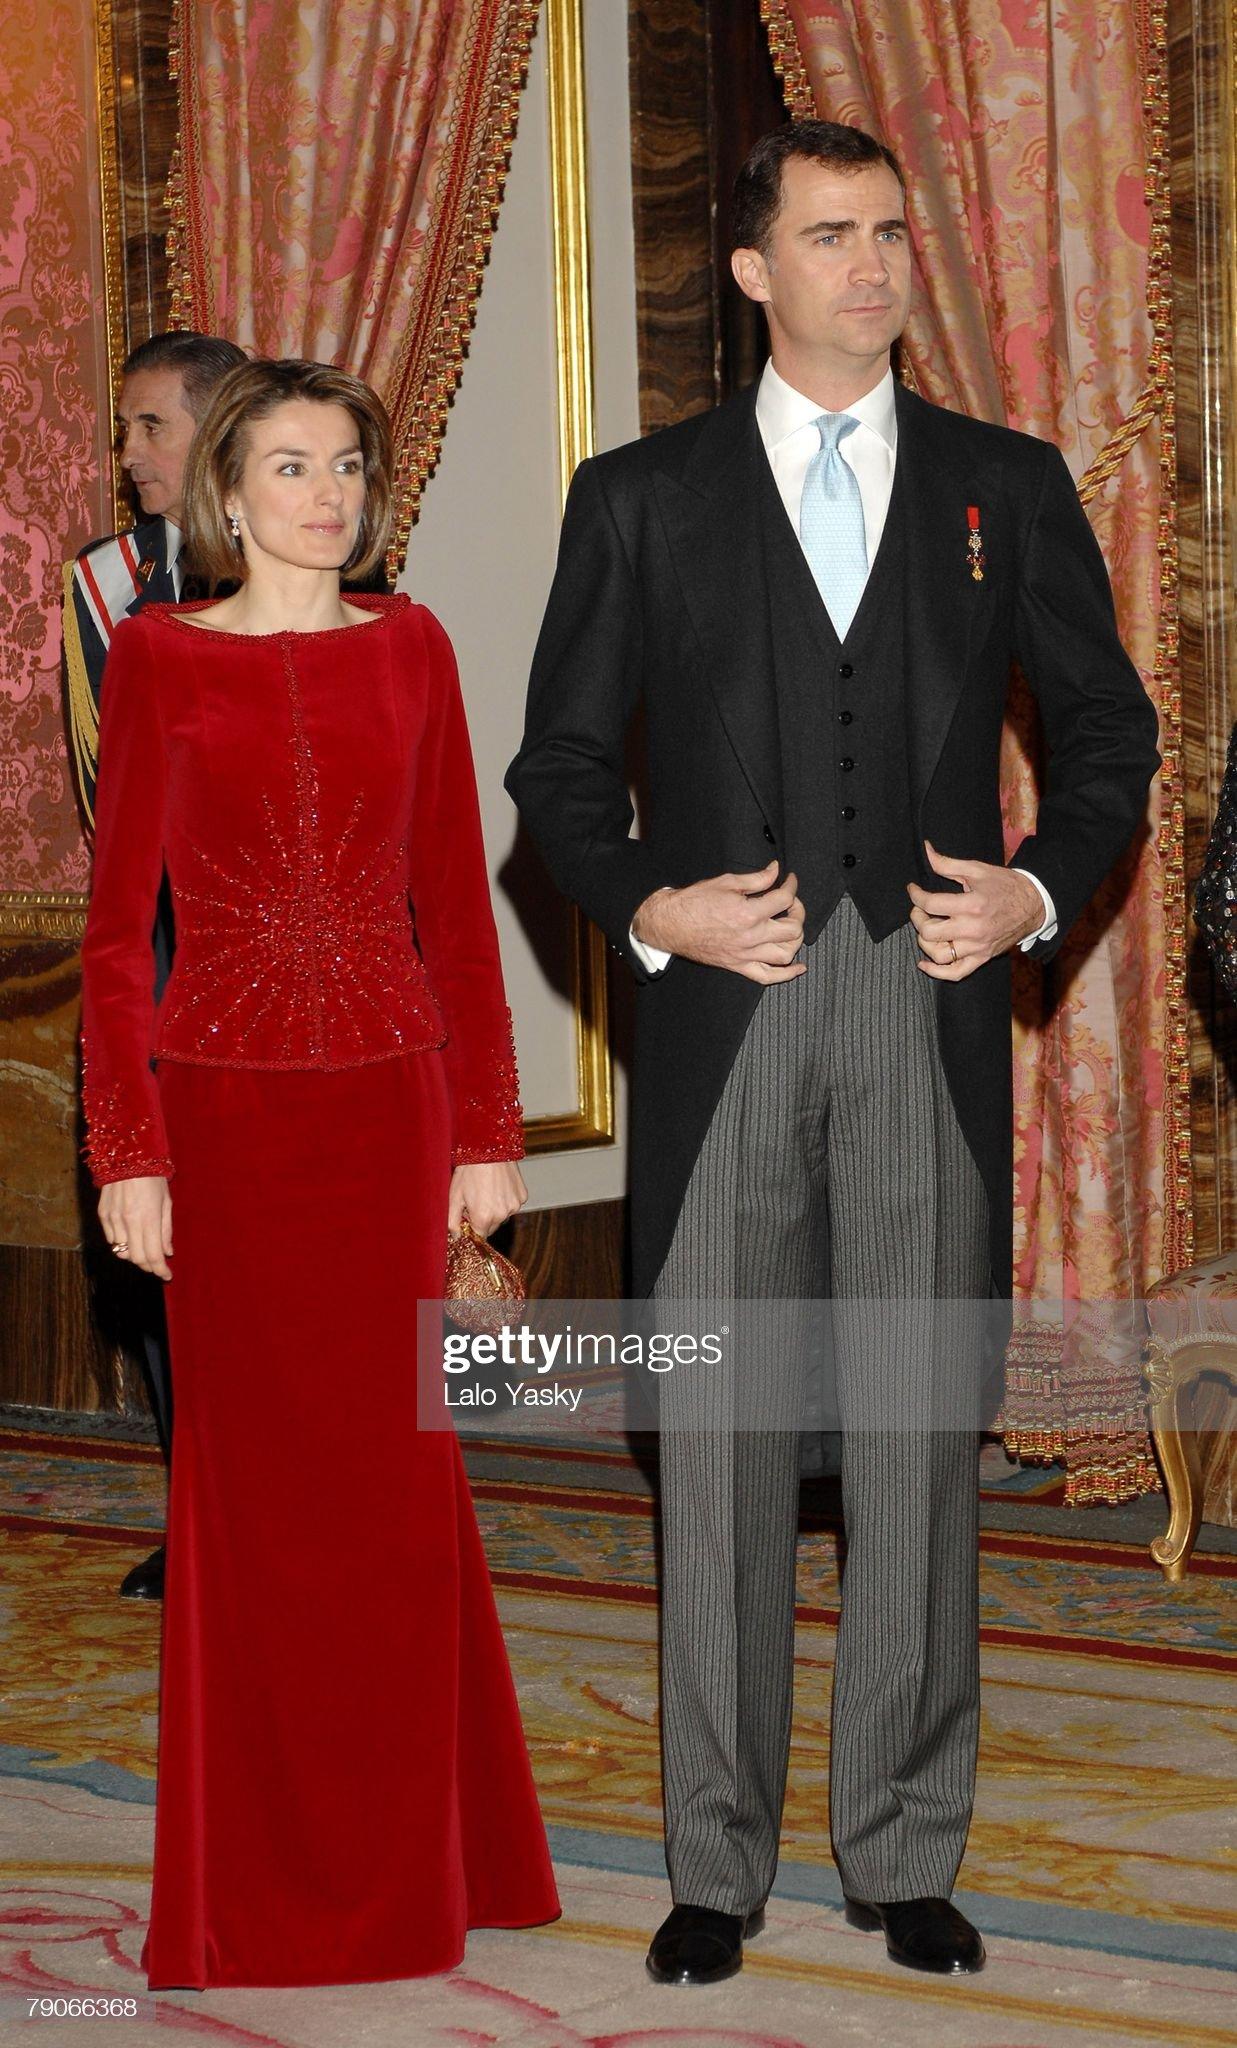 Вечерние наряды Королевы Летиции Spanish Royals Hosts The Annual Foriegn Ambassadors Reception : News Photo